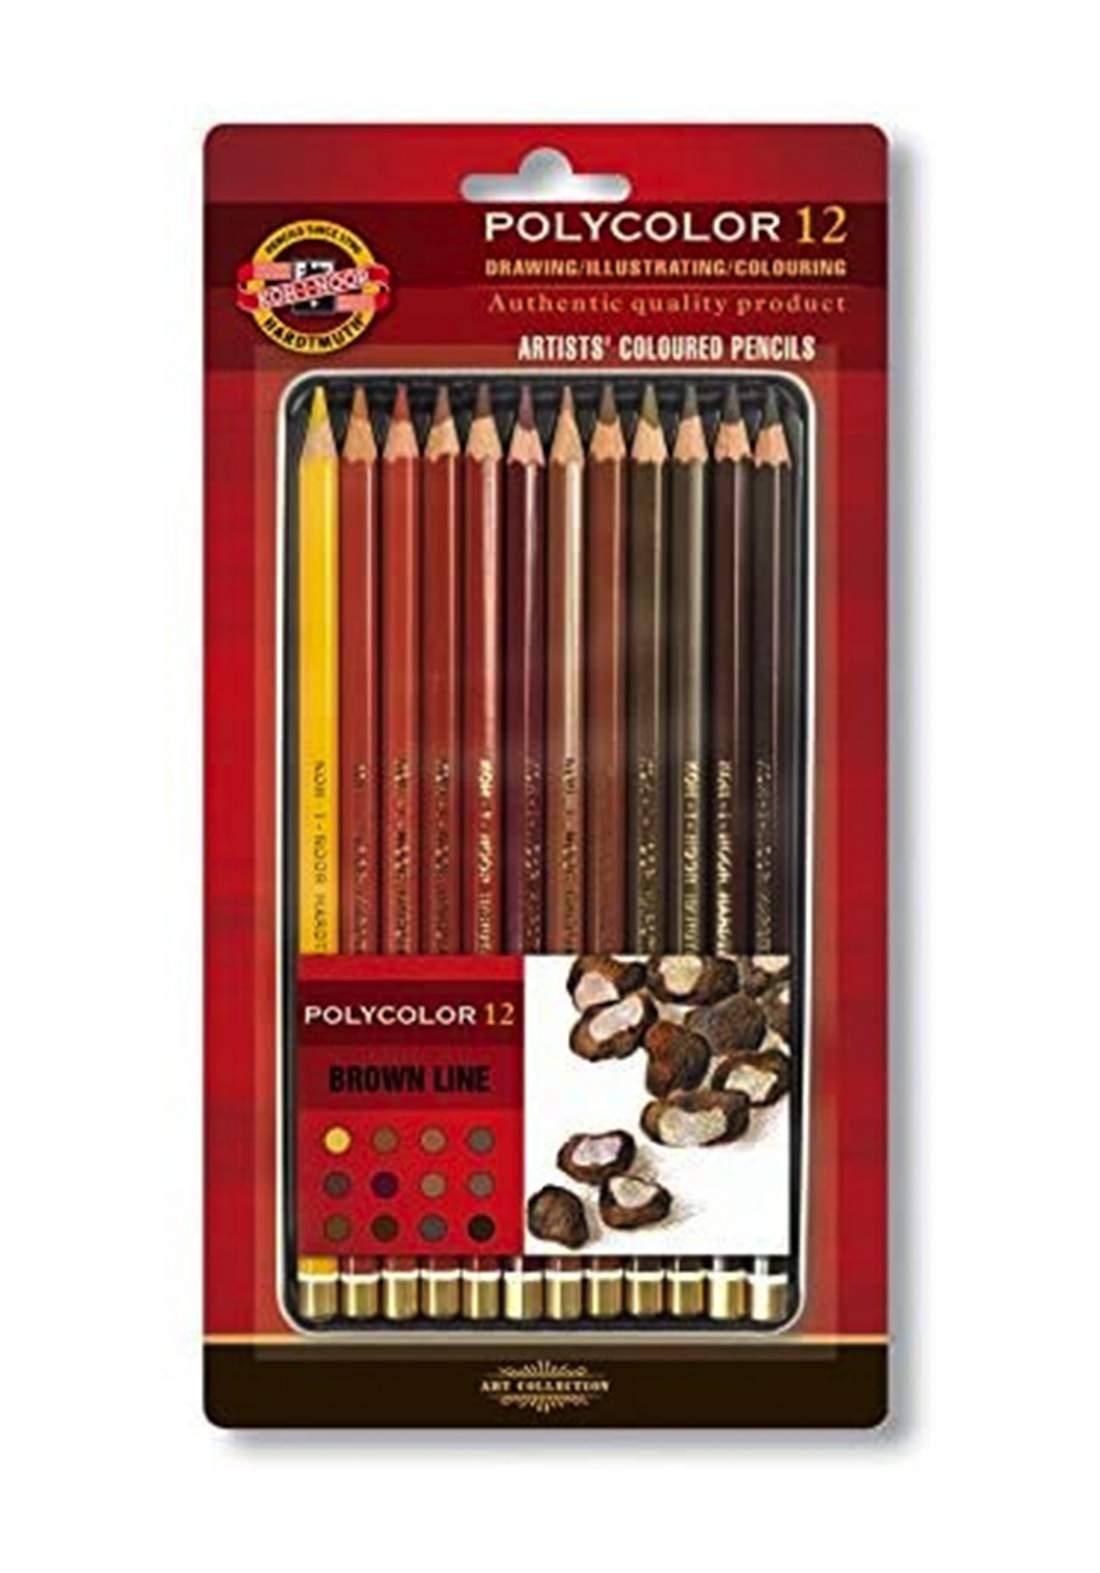 Koh-I-Noor Polycolor 12 Artists Coloured Pencils 3822 ألوان باستيل خشبية  12 لون